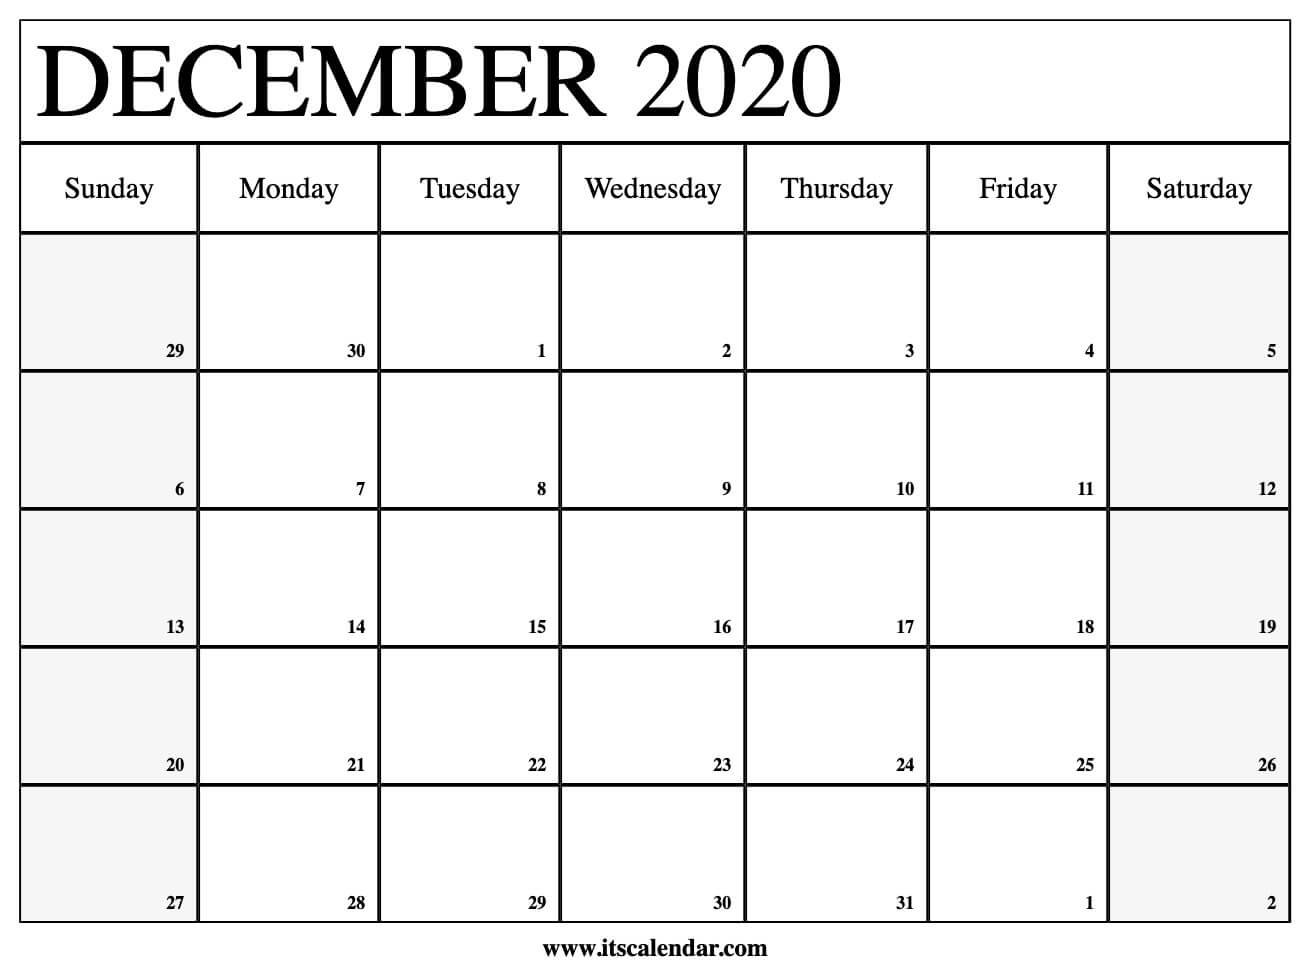 Printable Calendar December 2020.Free Printable December 2020 Calendar